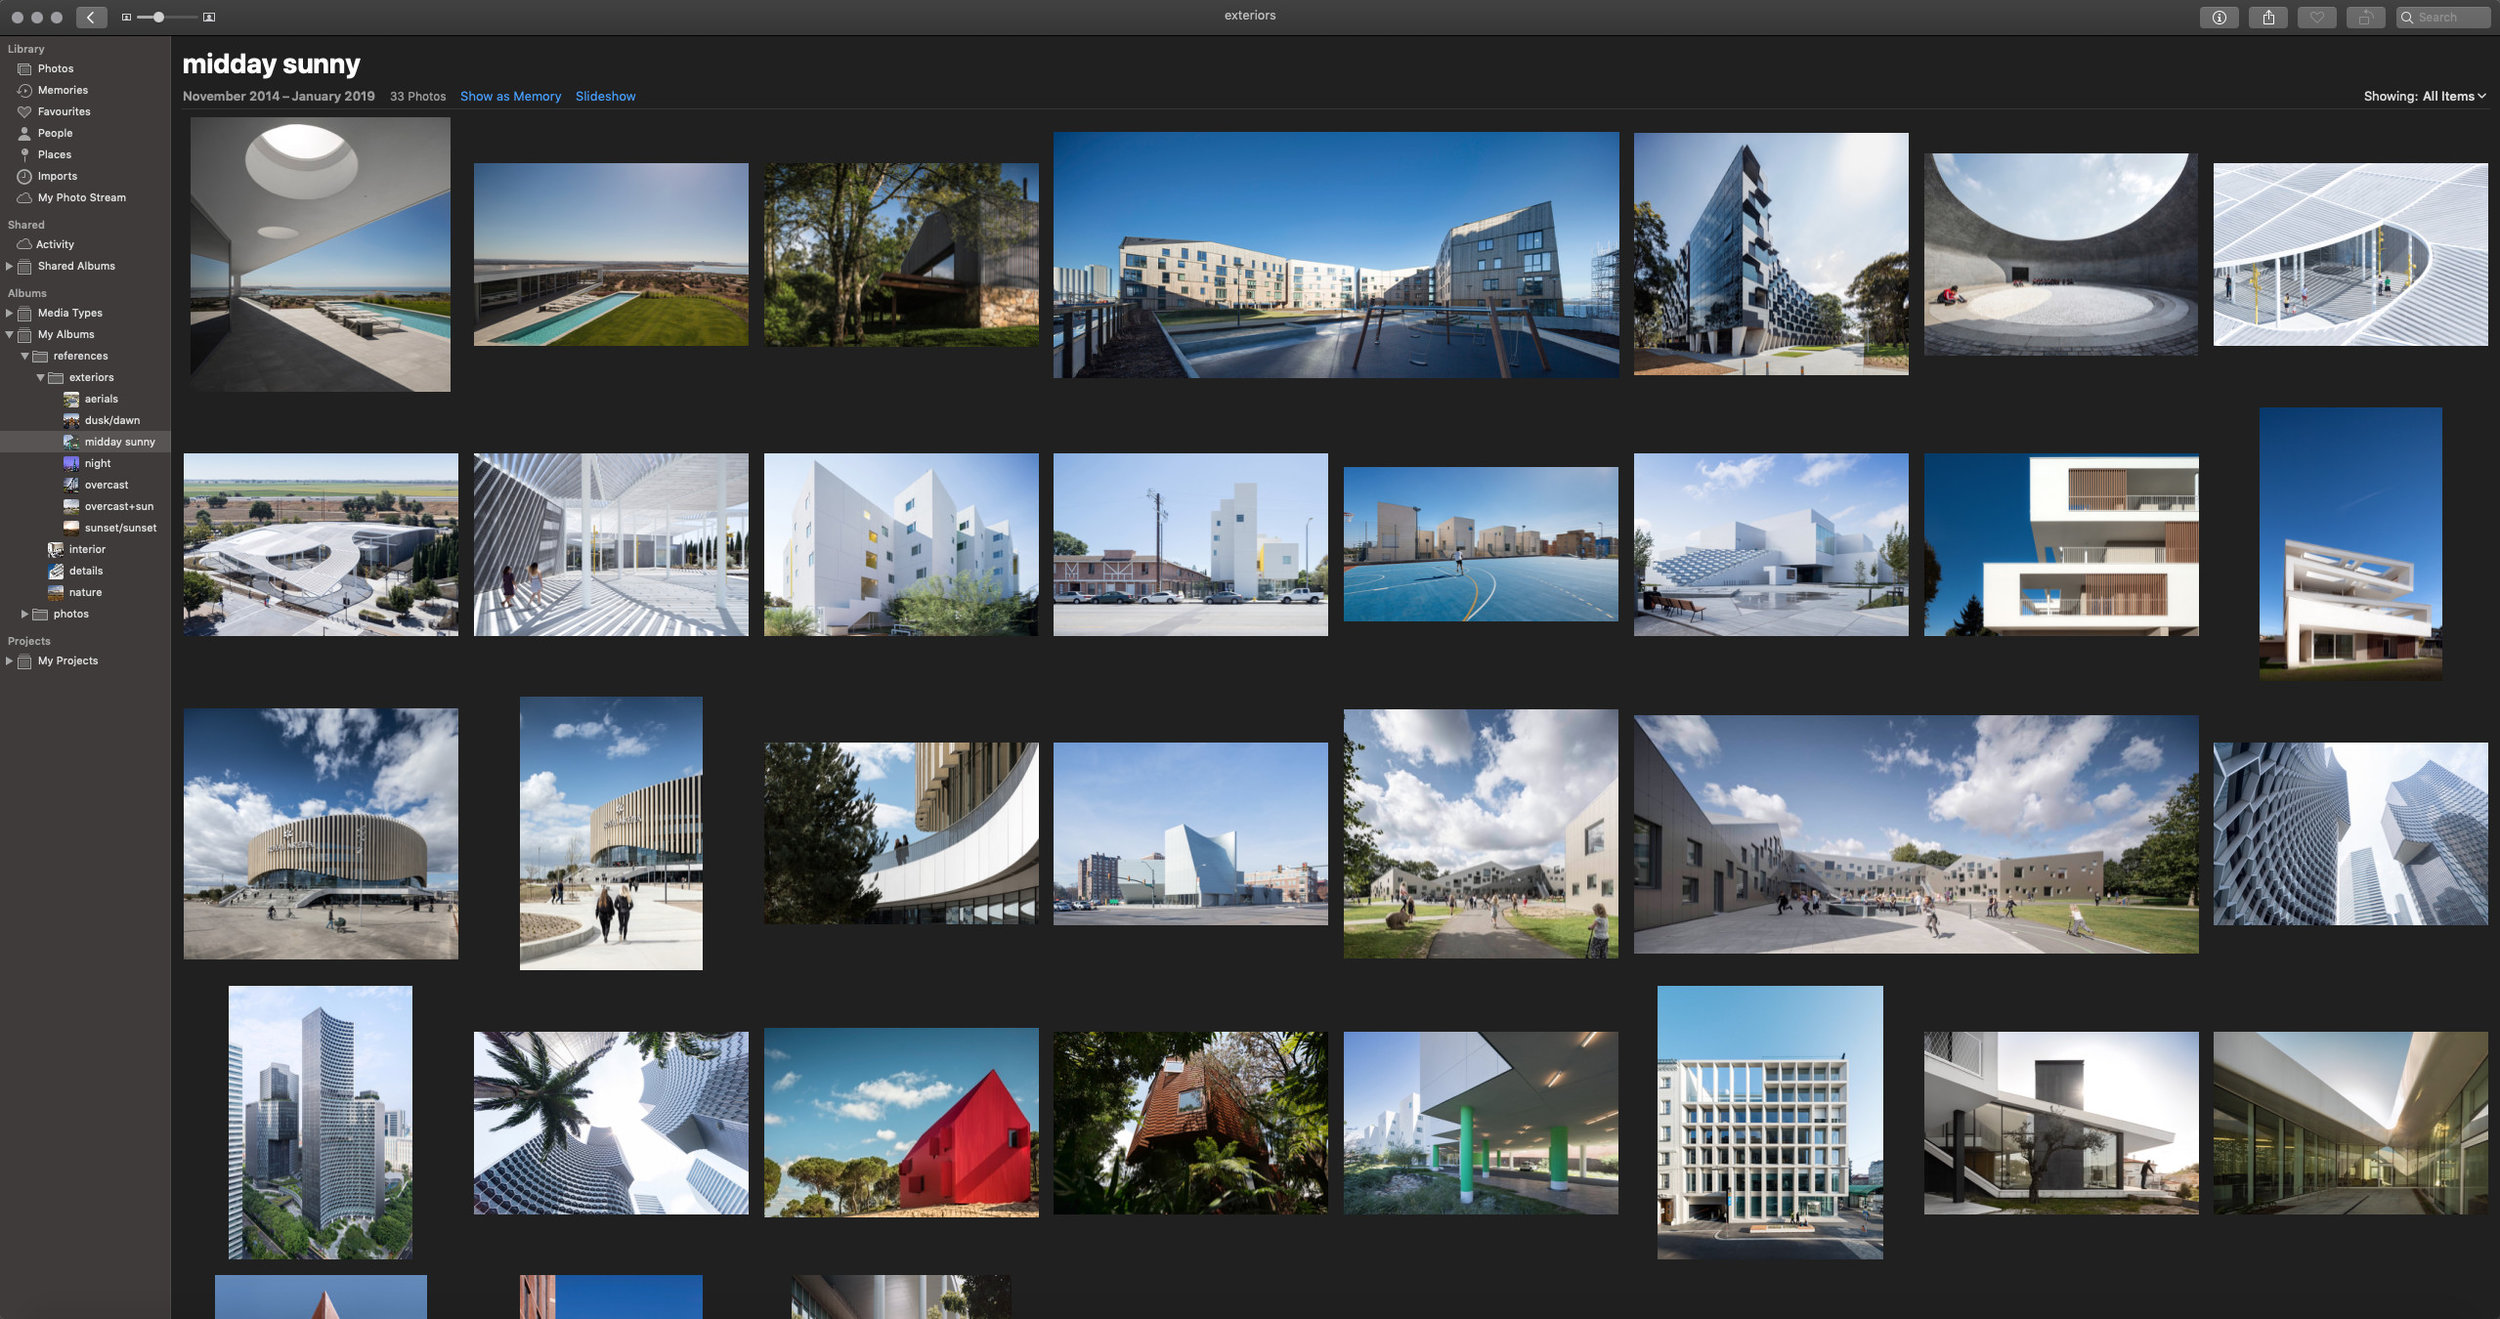 yurii-suhov-photo-references-midday-sunny.jpg